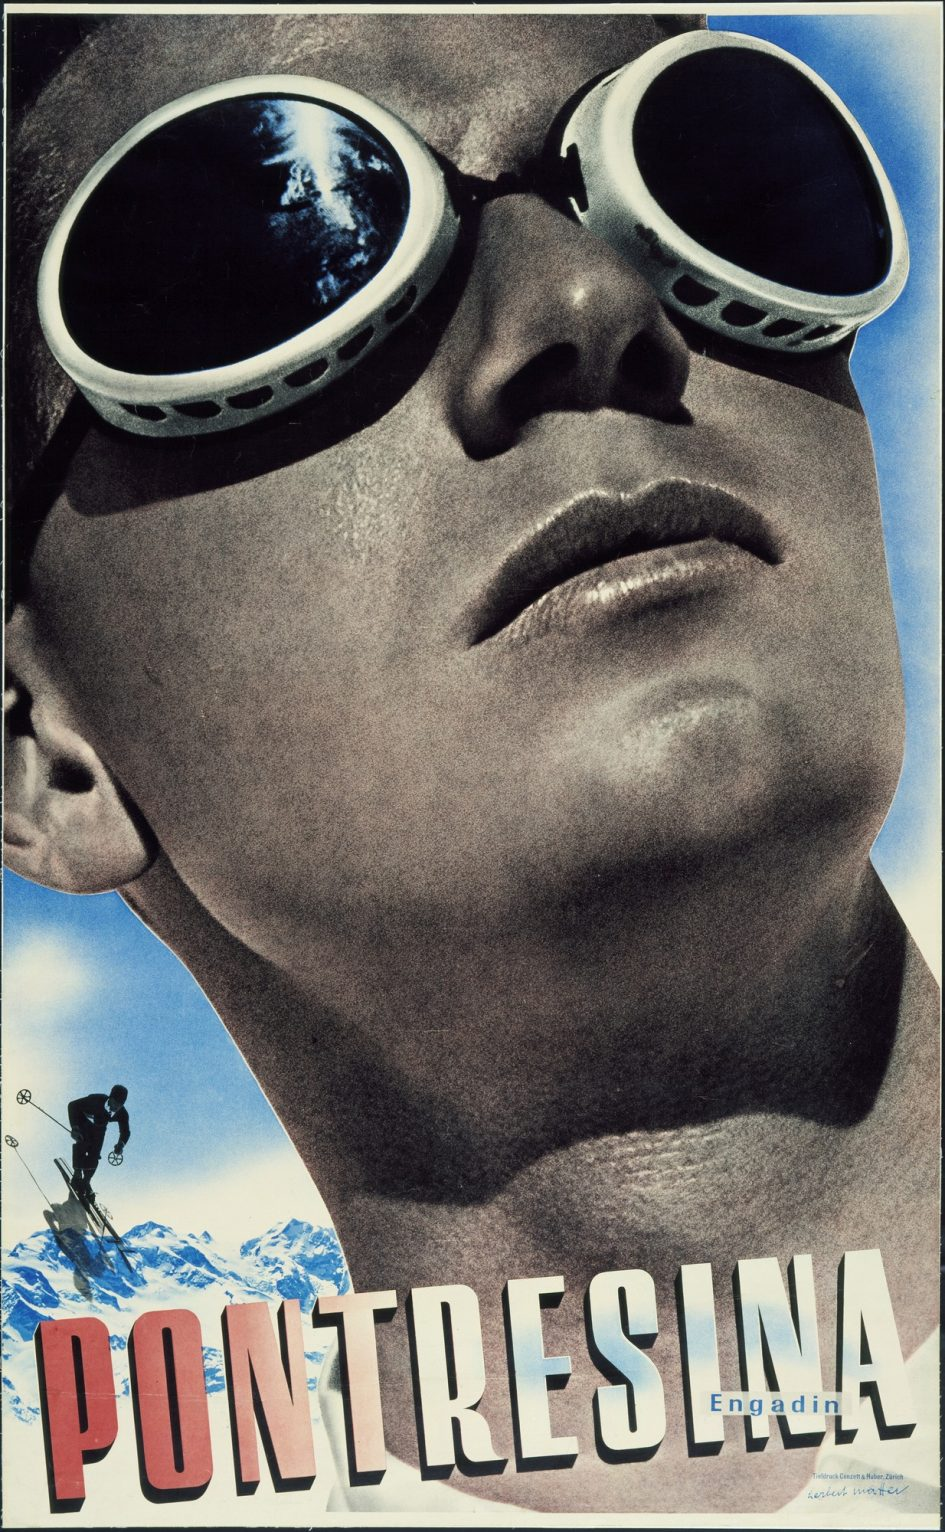 Herbert Matter Travel Poster